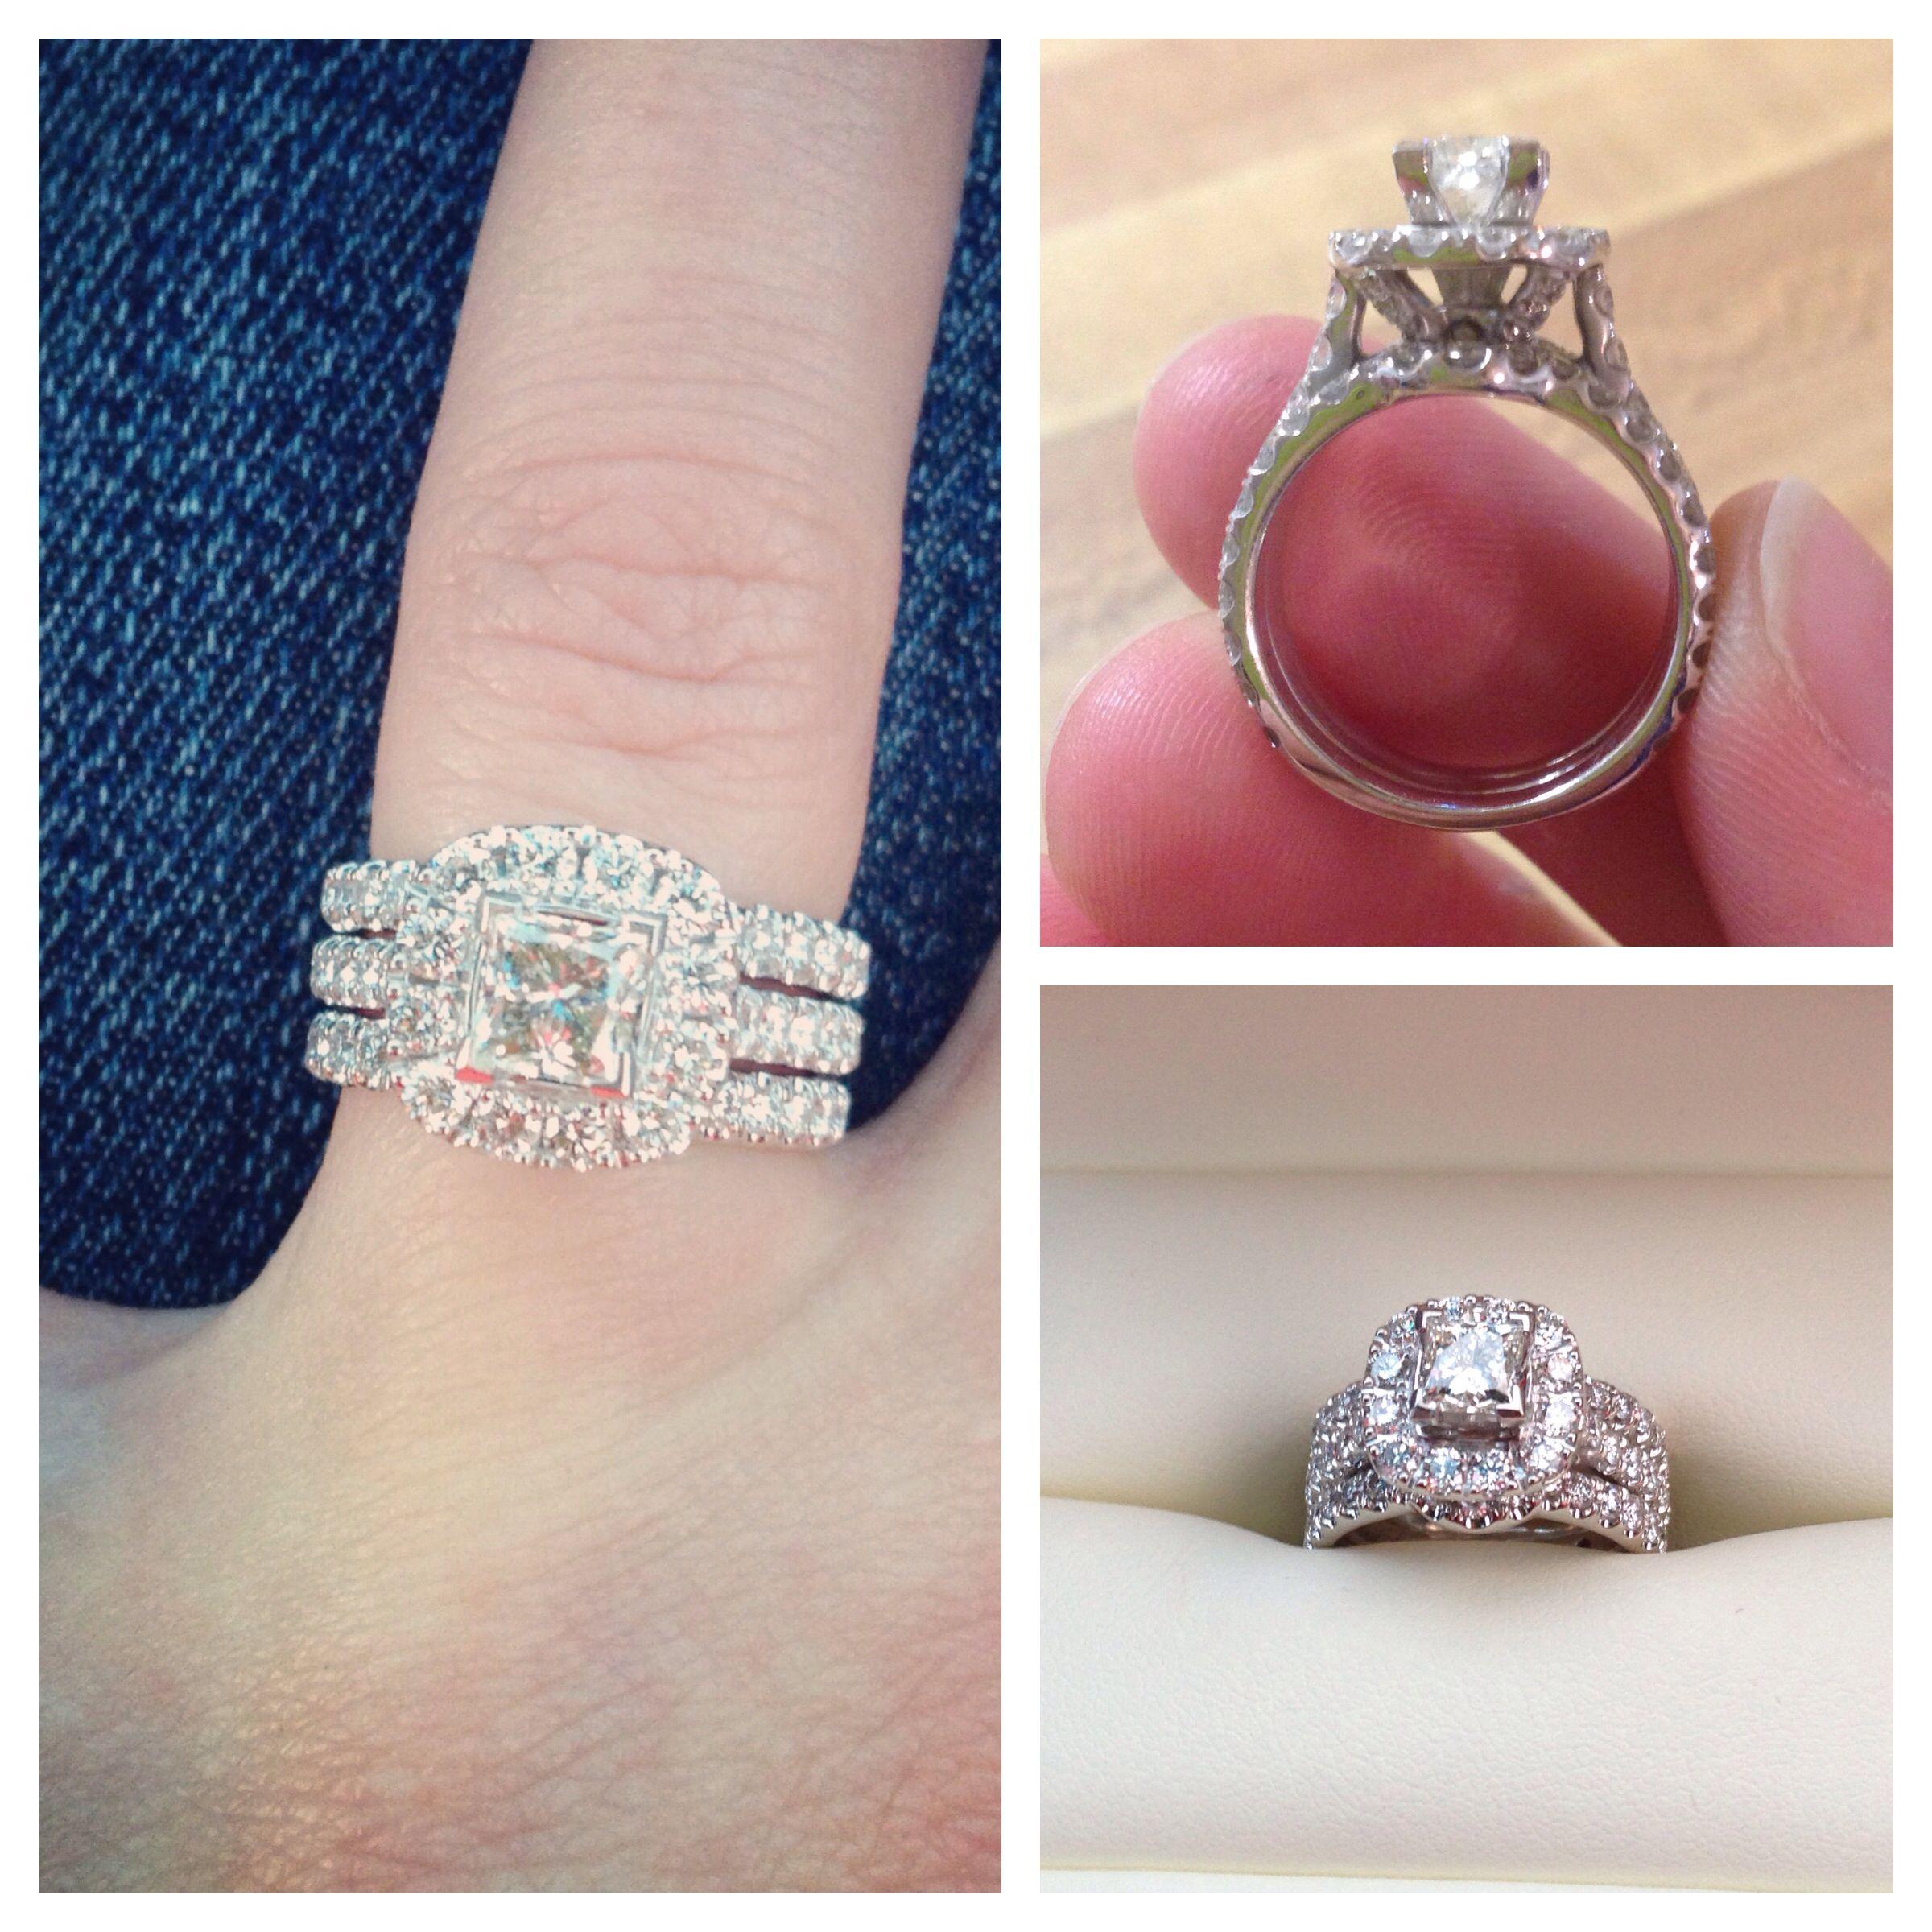 neil lane wedding bands My amazing wedding ring from my amazing husband Neil Lane bridal set with 3rd band